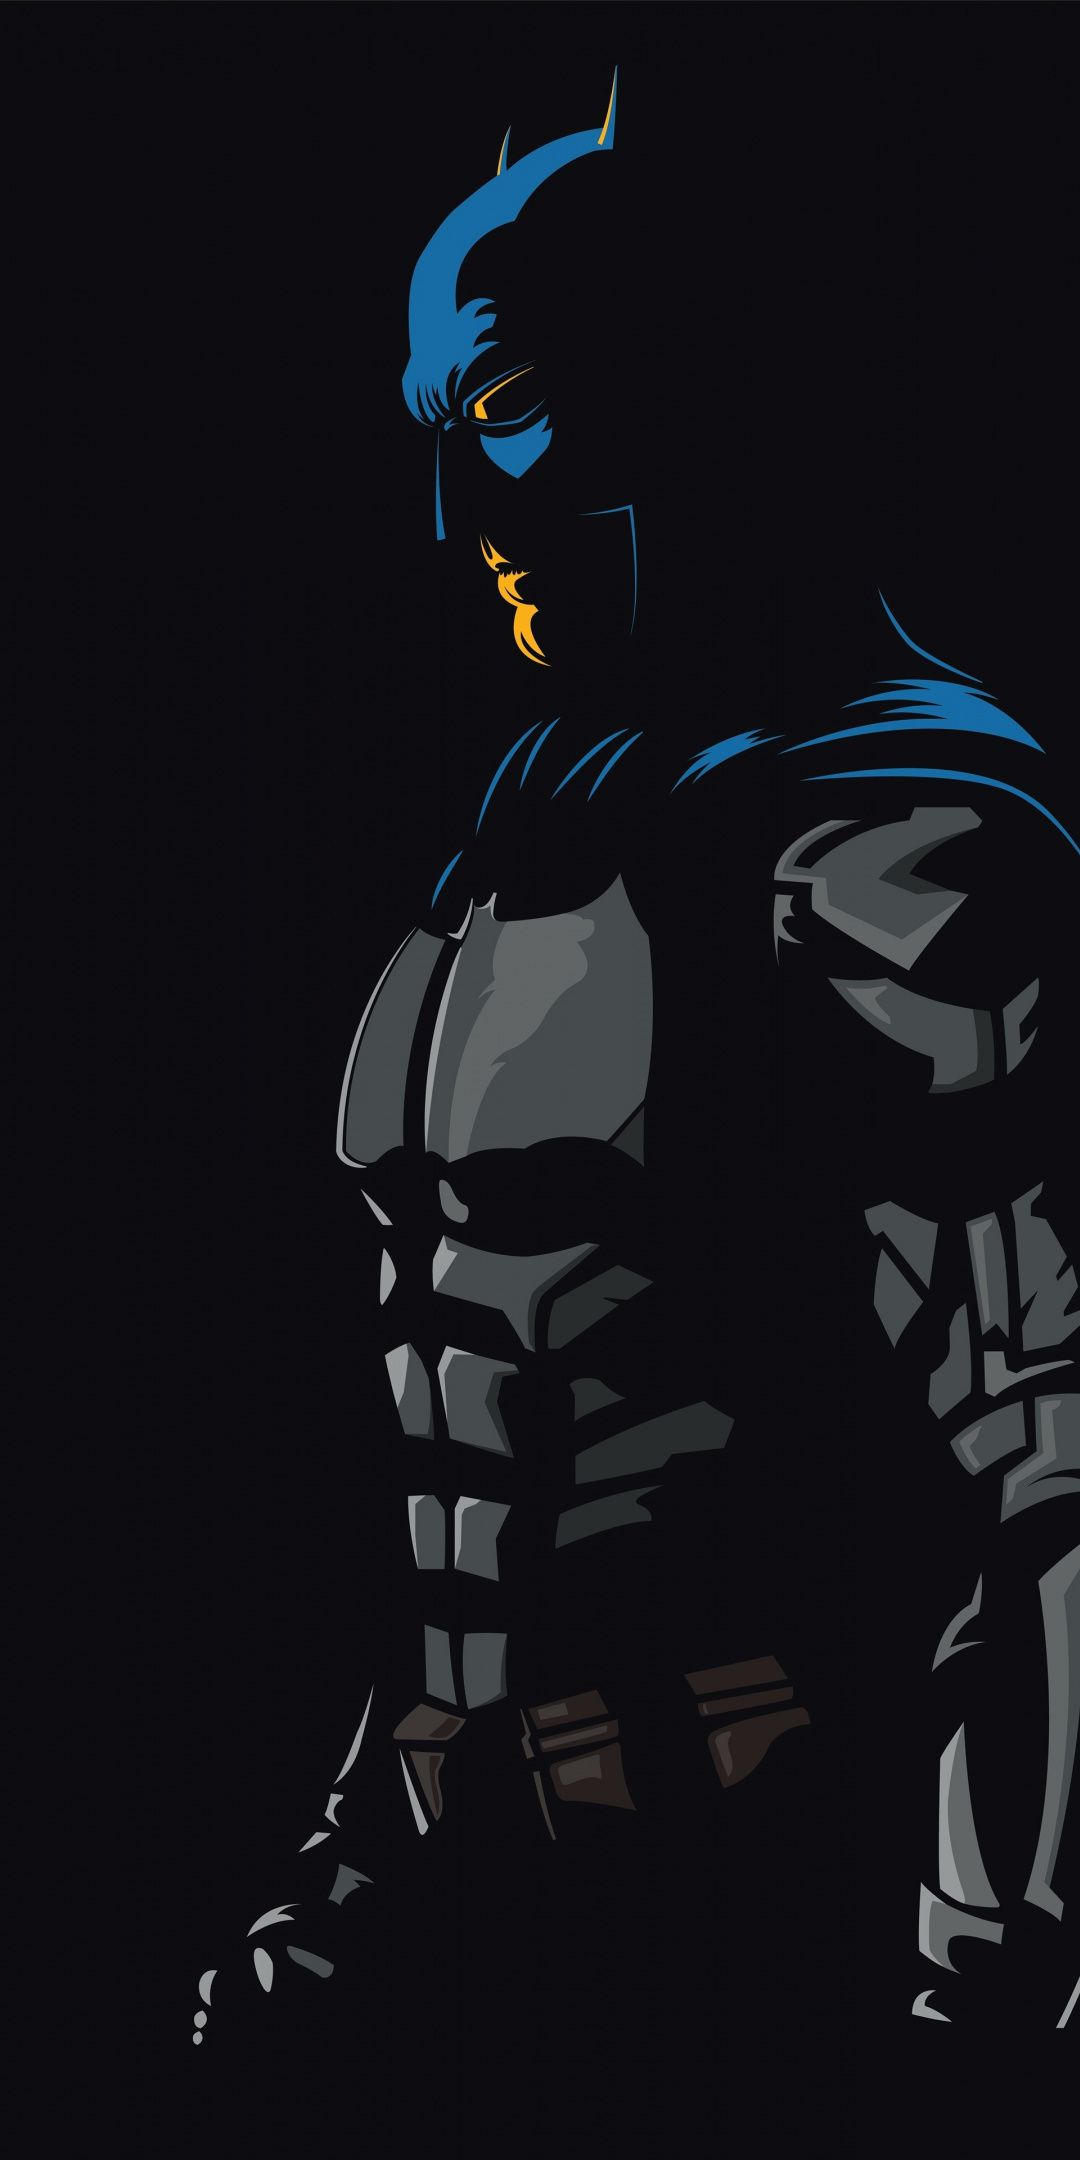 Batman Dark Knight Justice League Dc Comics Minimal 1080x2160 Wallpaper Batman Artwork Superhero Wallpaper Batman Wallpaper